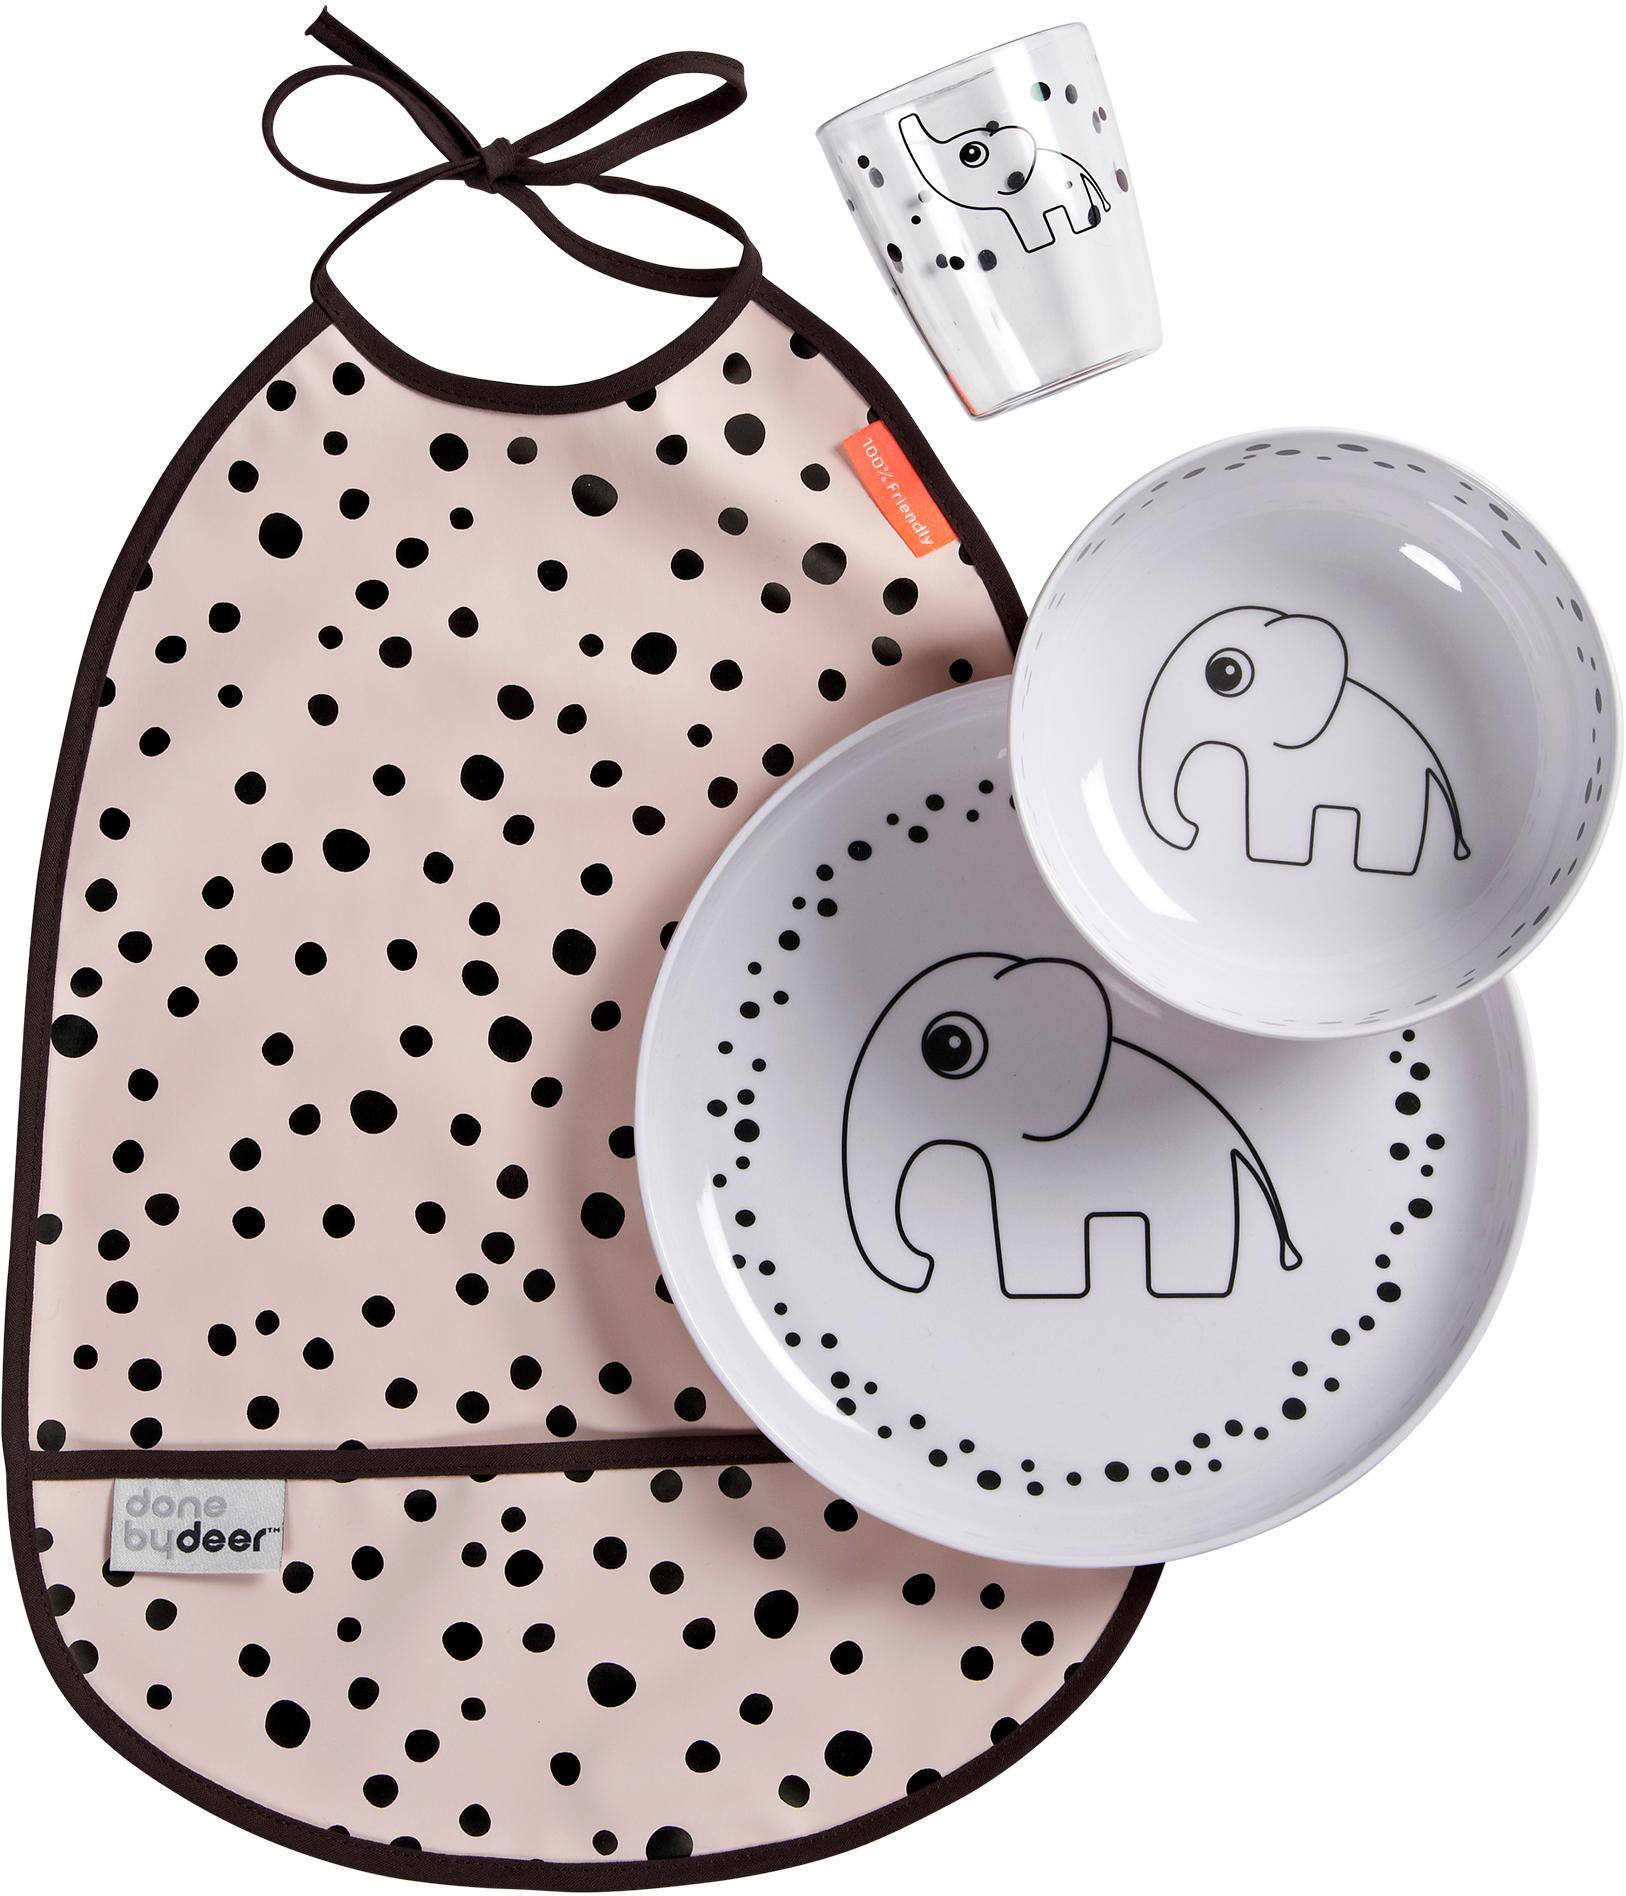 Set 4 piatti Happy Dots, Rosa, Set in varie misure